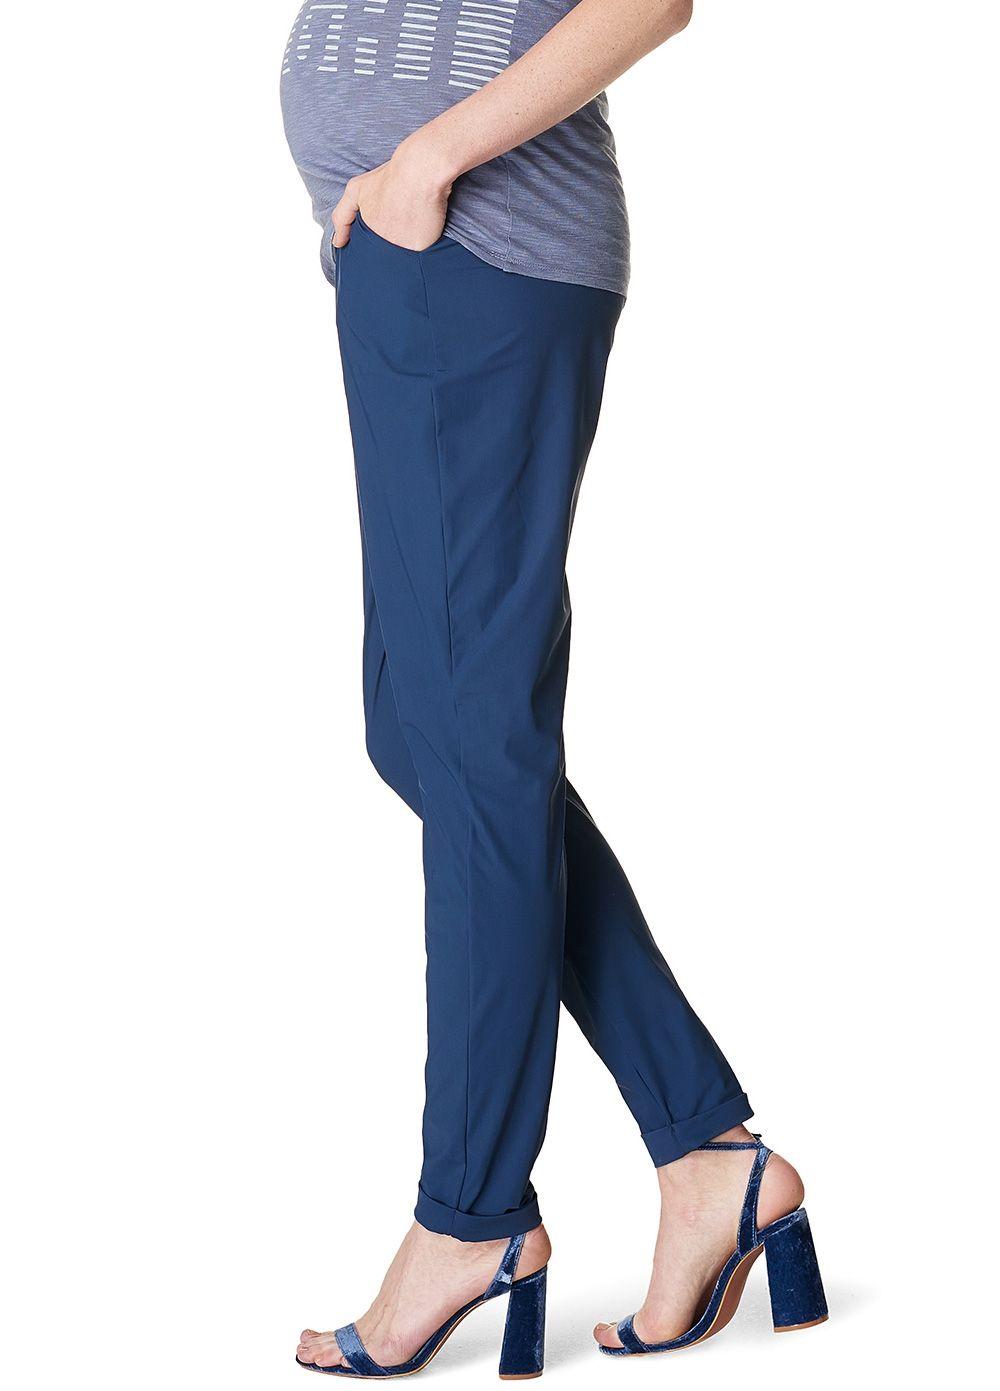 a3d5dfd549146 Aranka Navy Maternity Trousers by Noppies Navy Pants, Maternity Pants,  Workwear, Trousers,